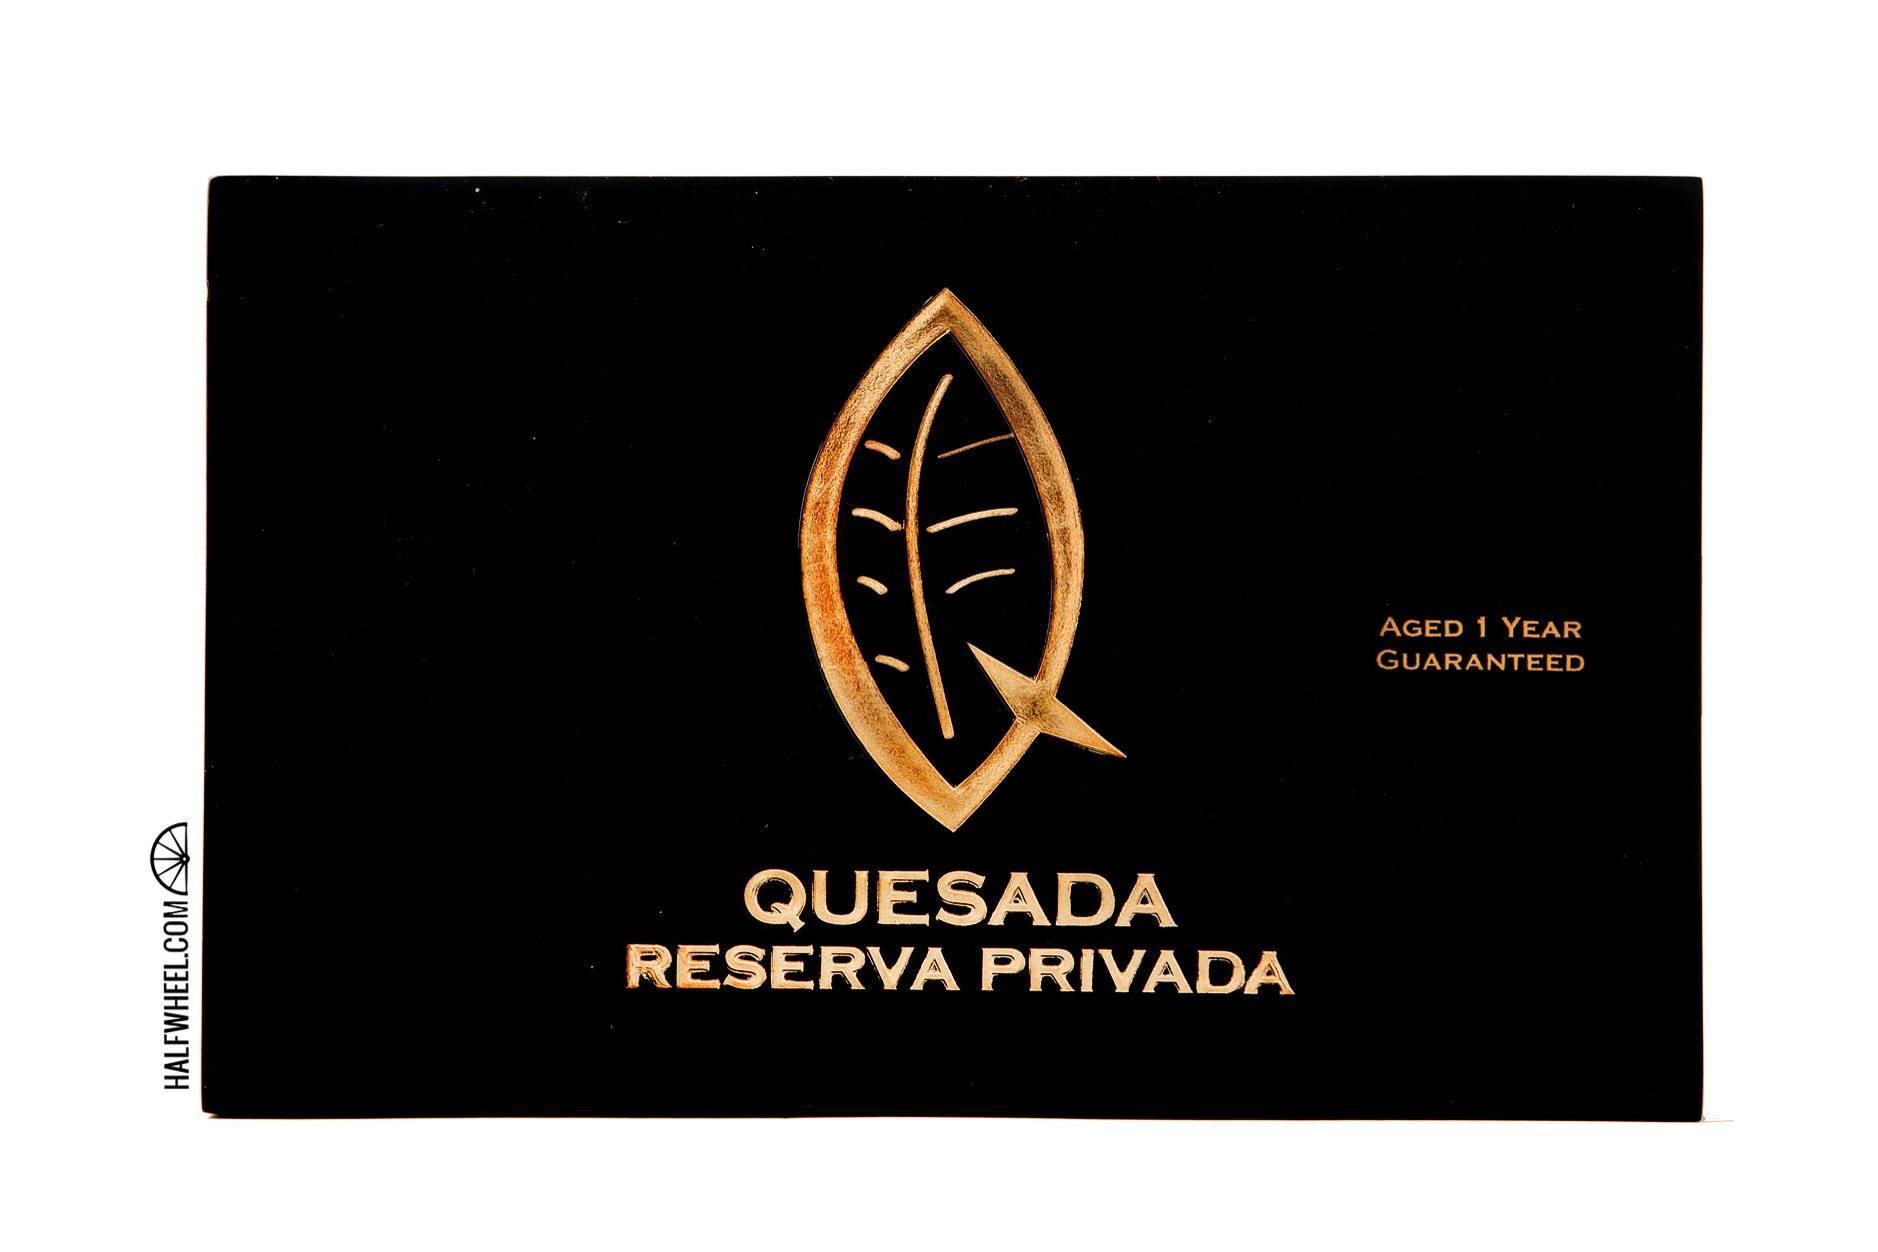 Quesada Reserva Privada box 1